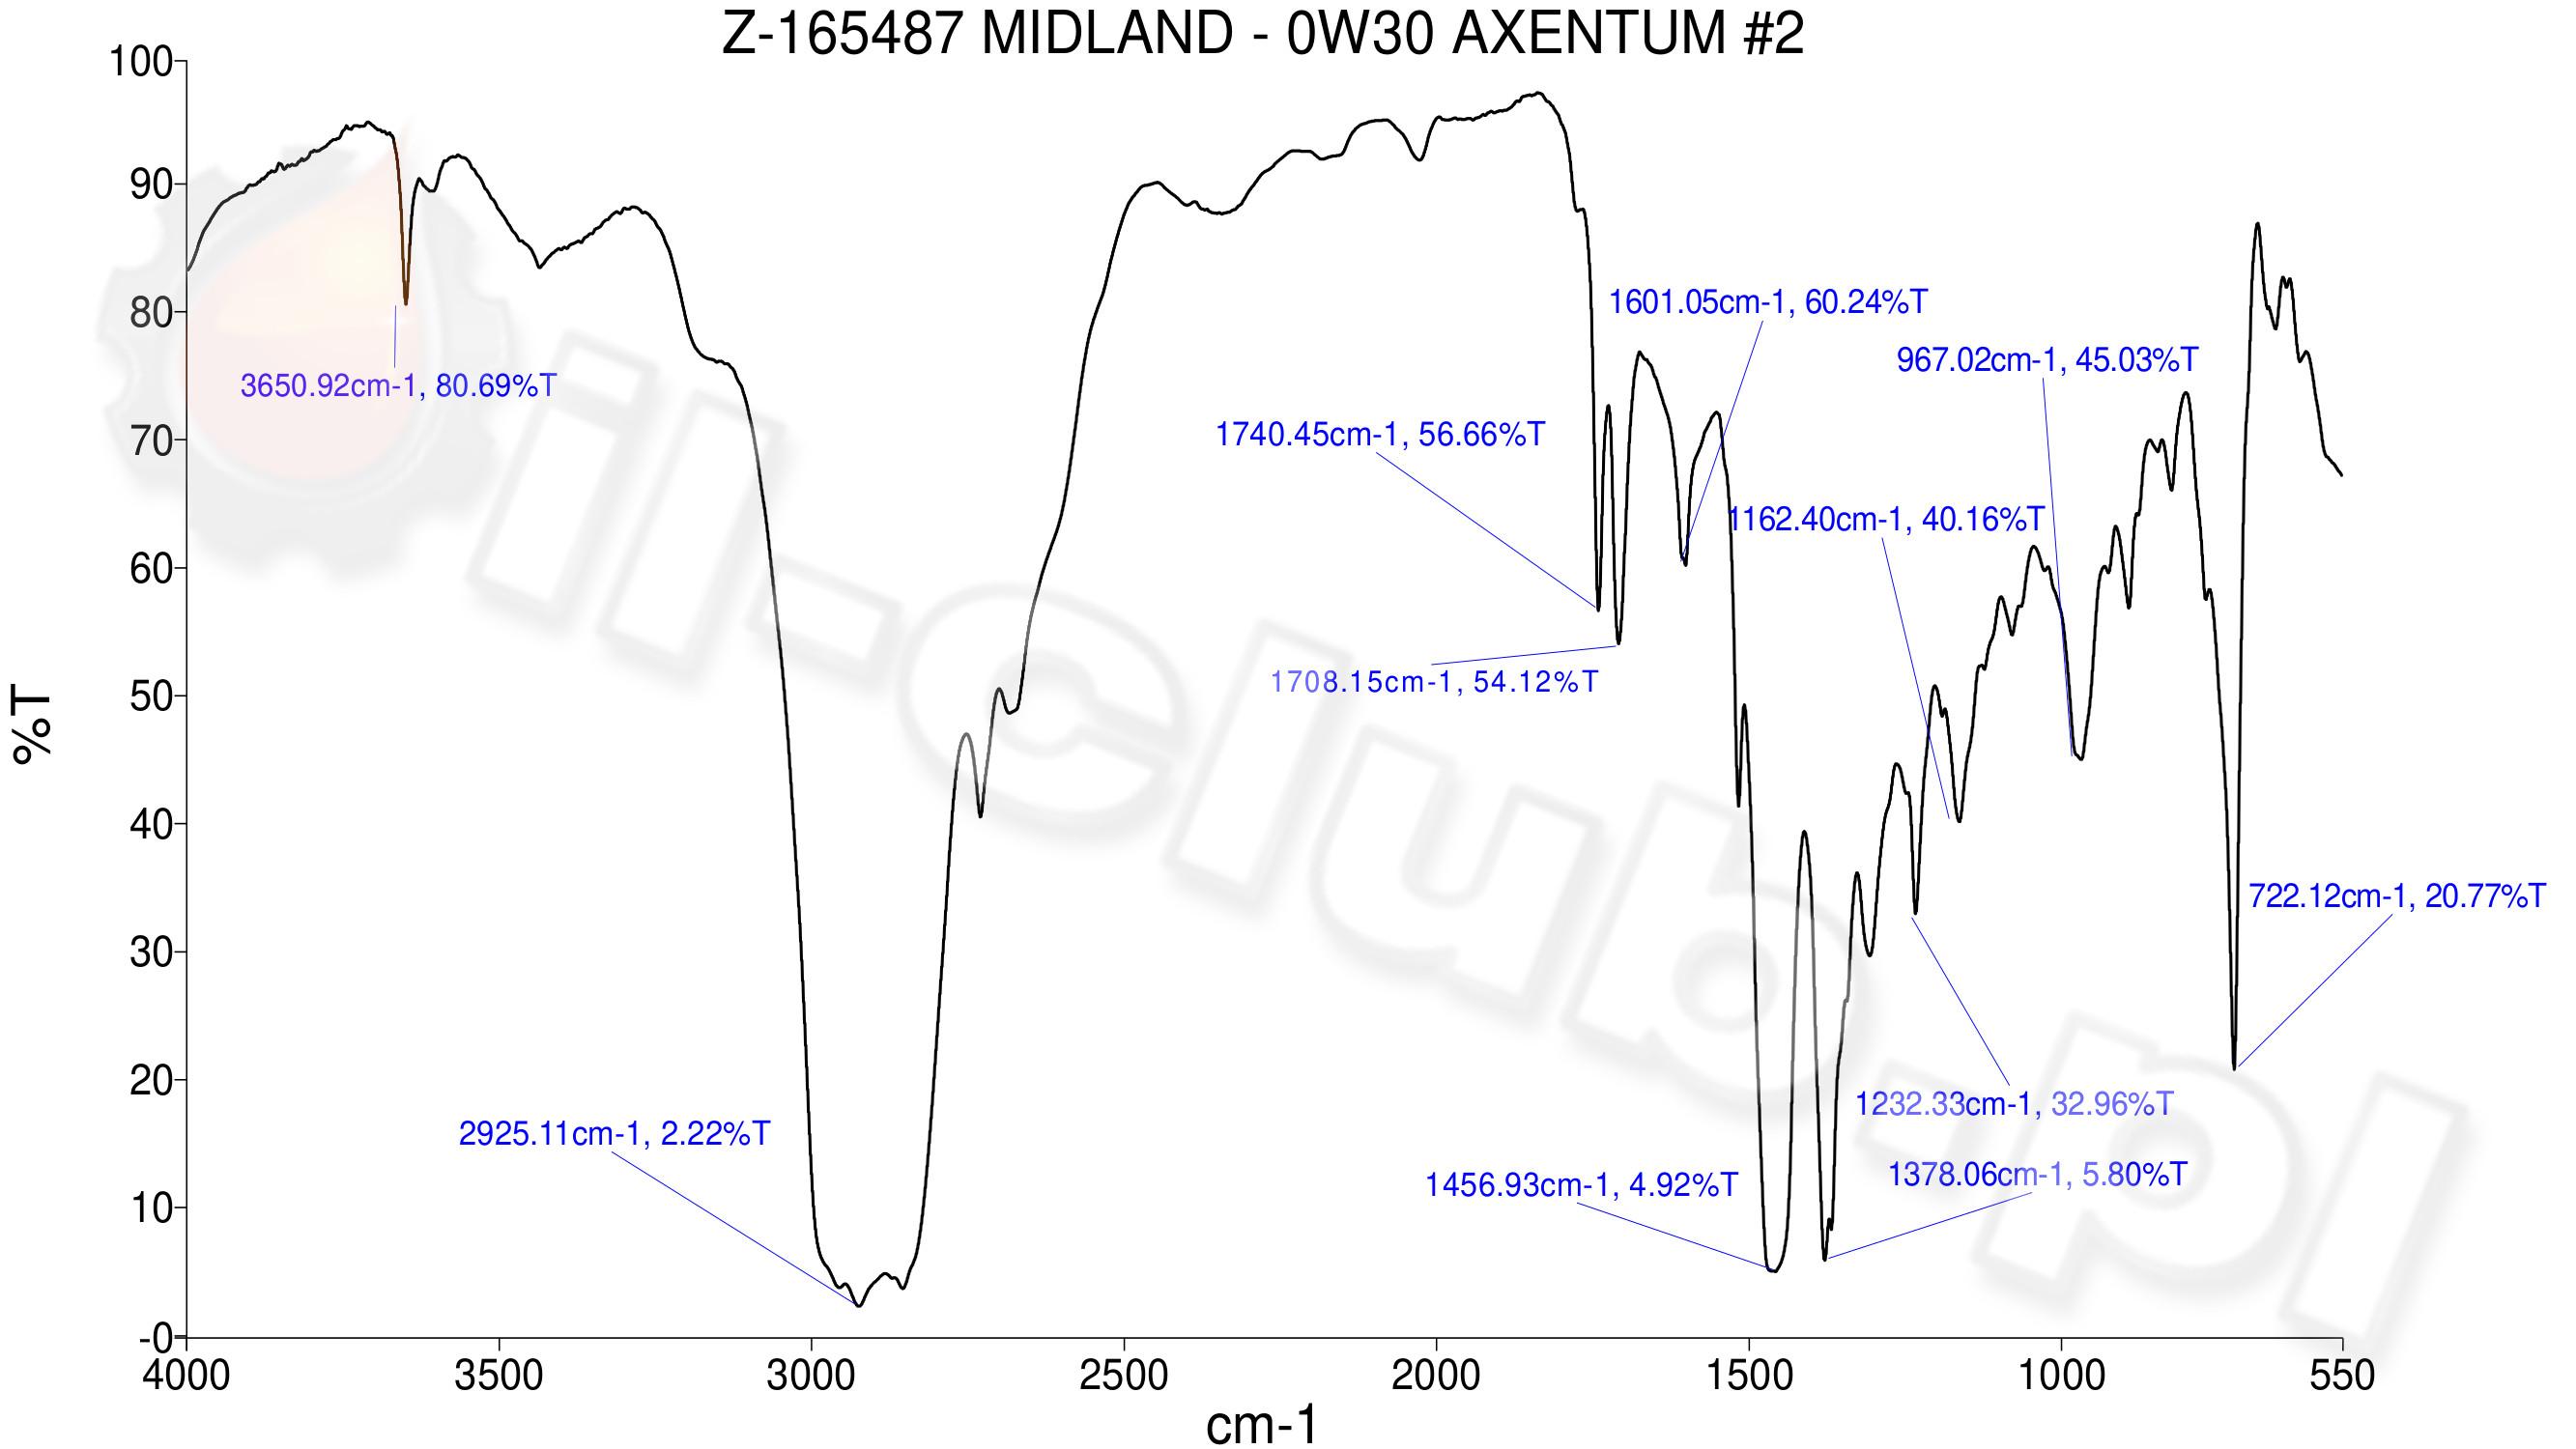 midland-axentum-0w30-ir2.jpg